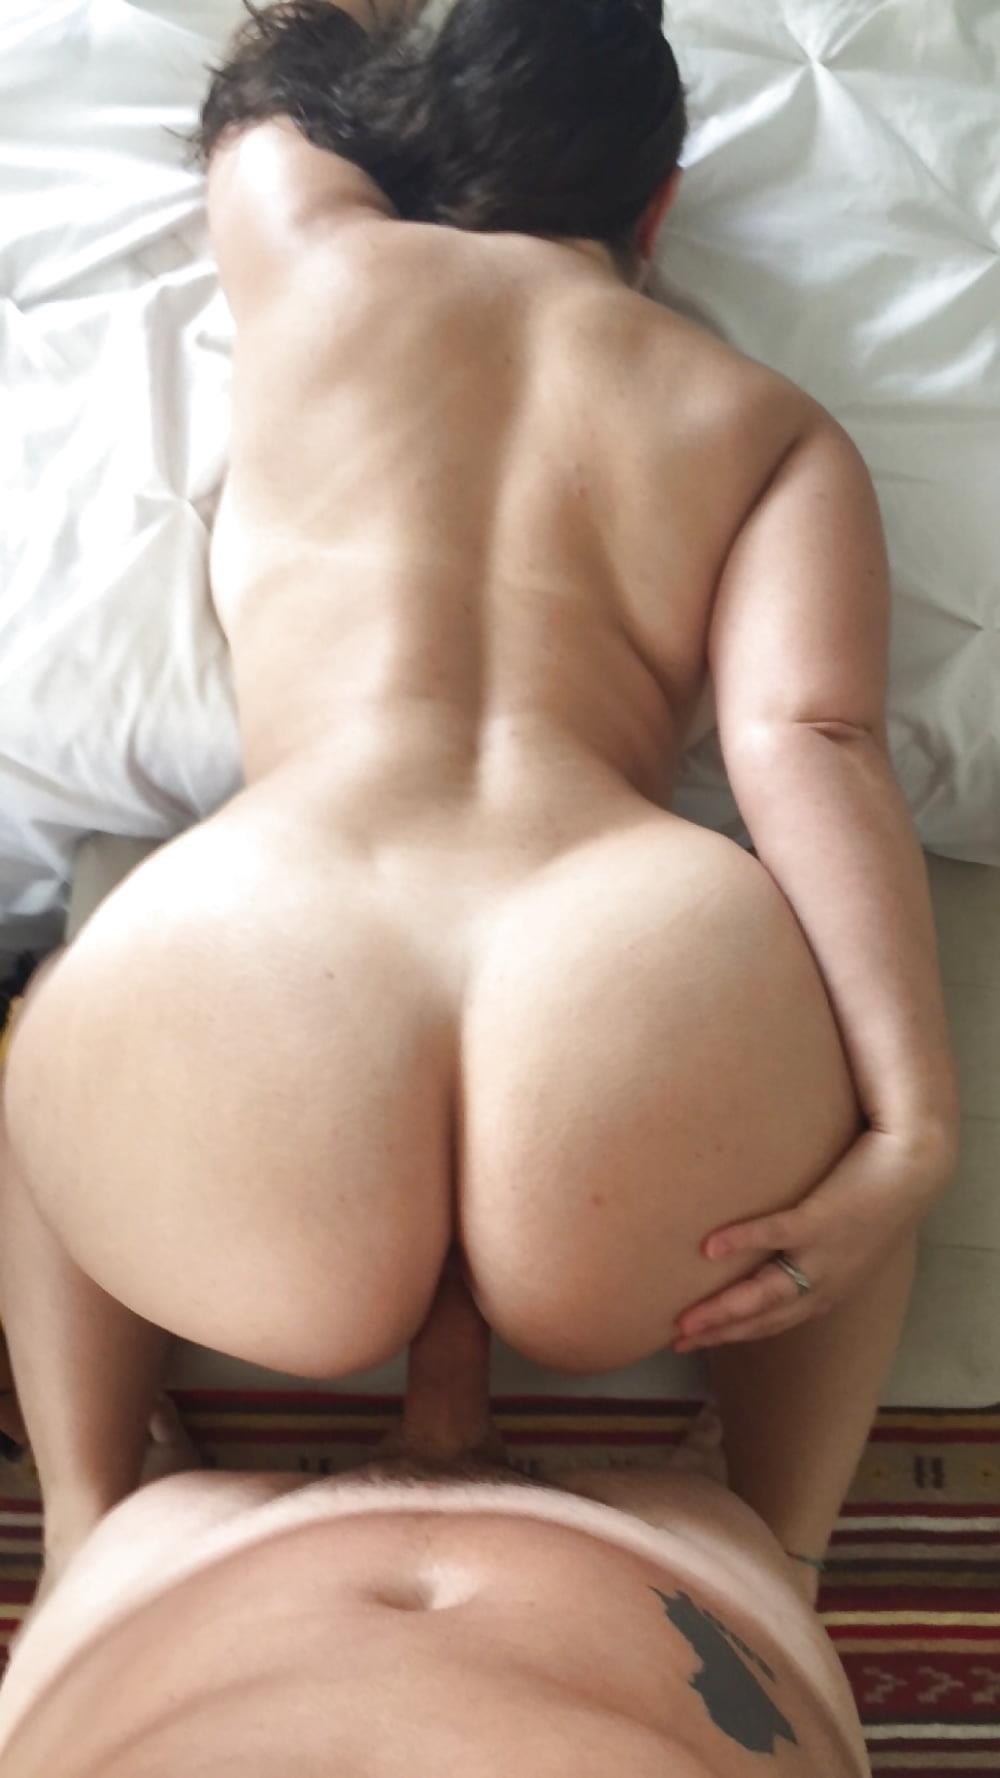 Big booty porn gallery-1235